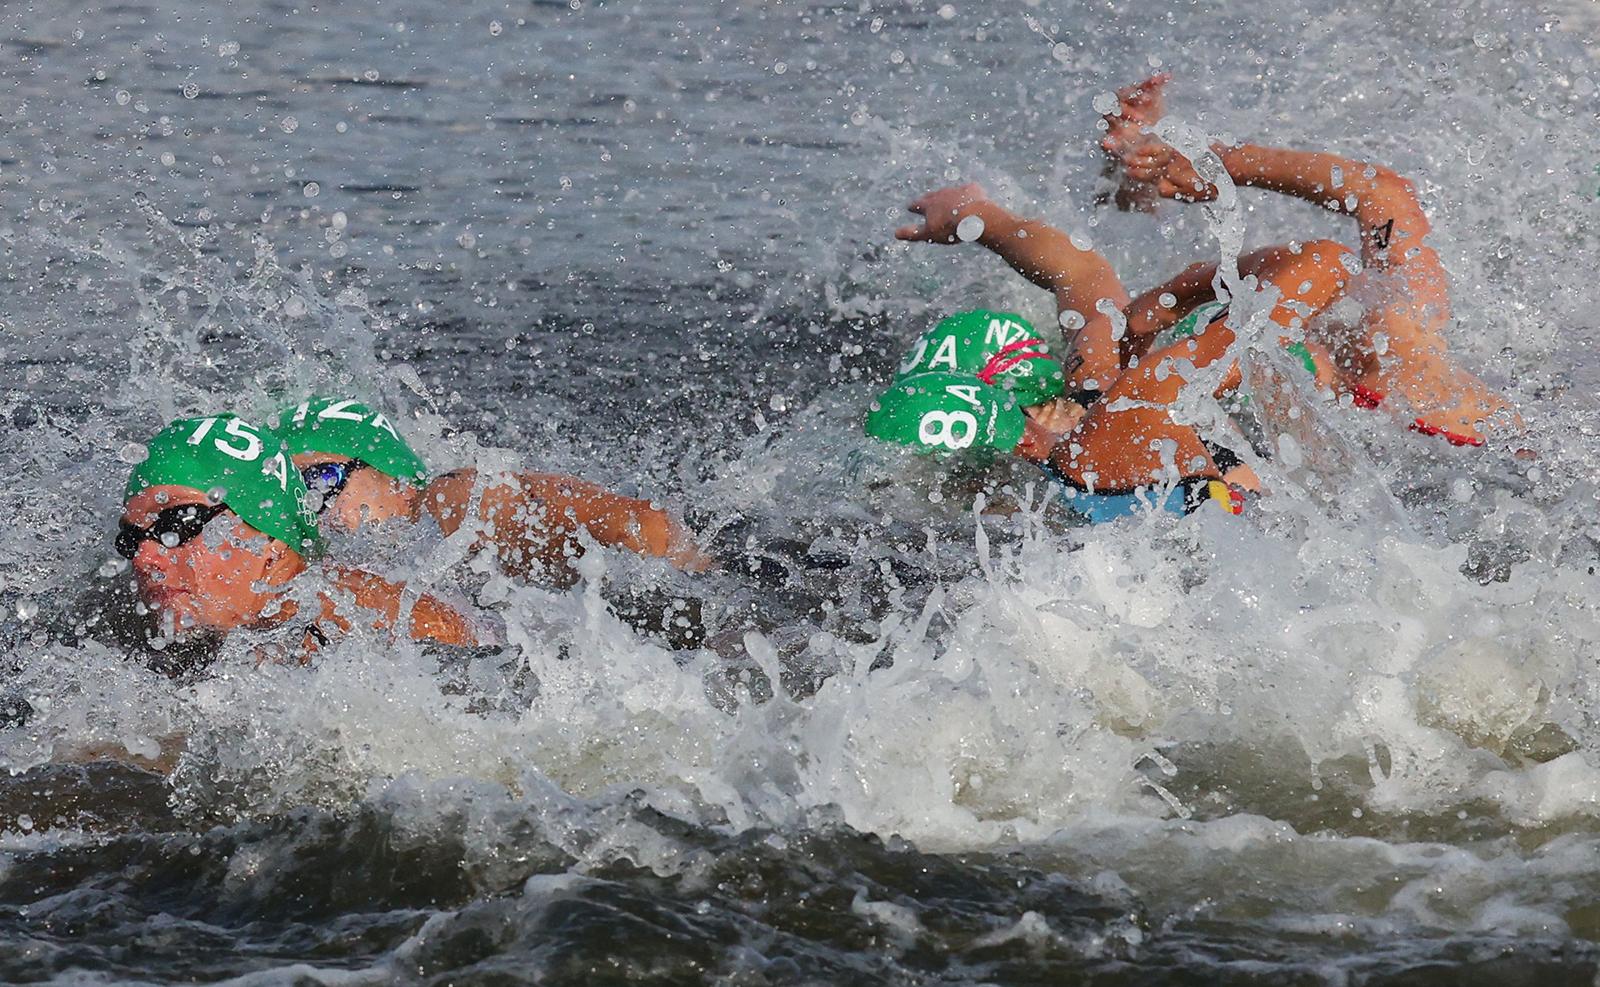 Tokyo 2020 Olympics - Triathlon - Mixed Team Relay - Final - Odaiba Marine Park, Tokyo, Japan - July 31, 2021. Zsanett Bragmayer of Hungary, Yuko Takahashi of Japan, Claire Michel of Belgium and Ainsley Thorpe of New Zealand in action. REUTERS